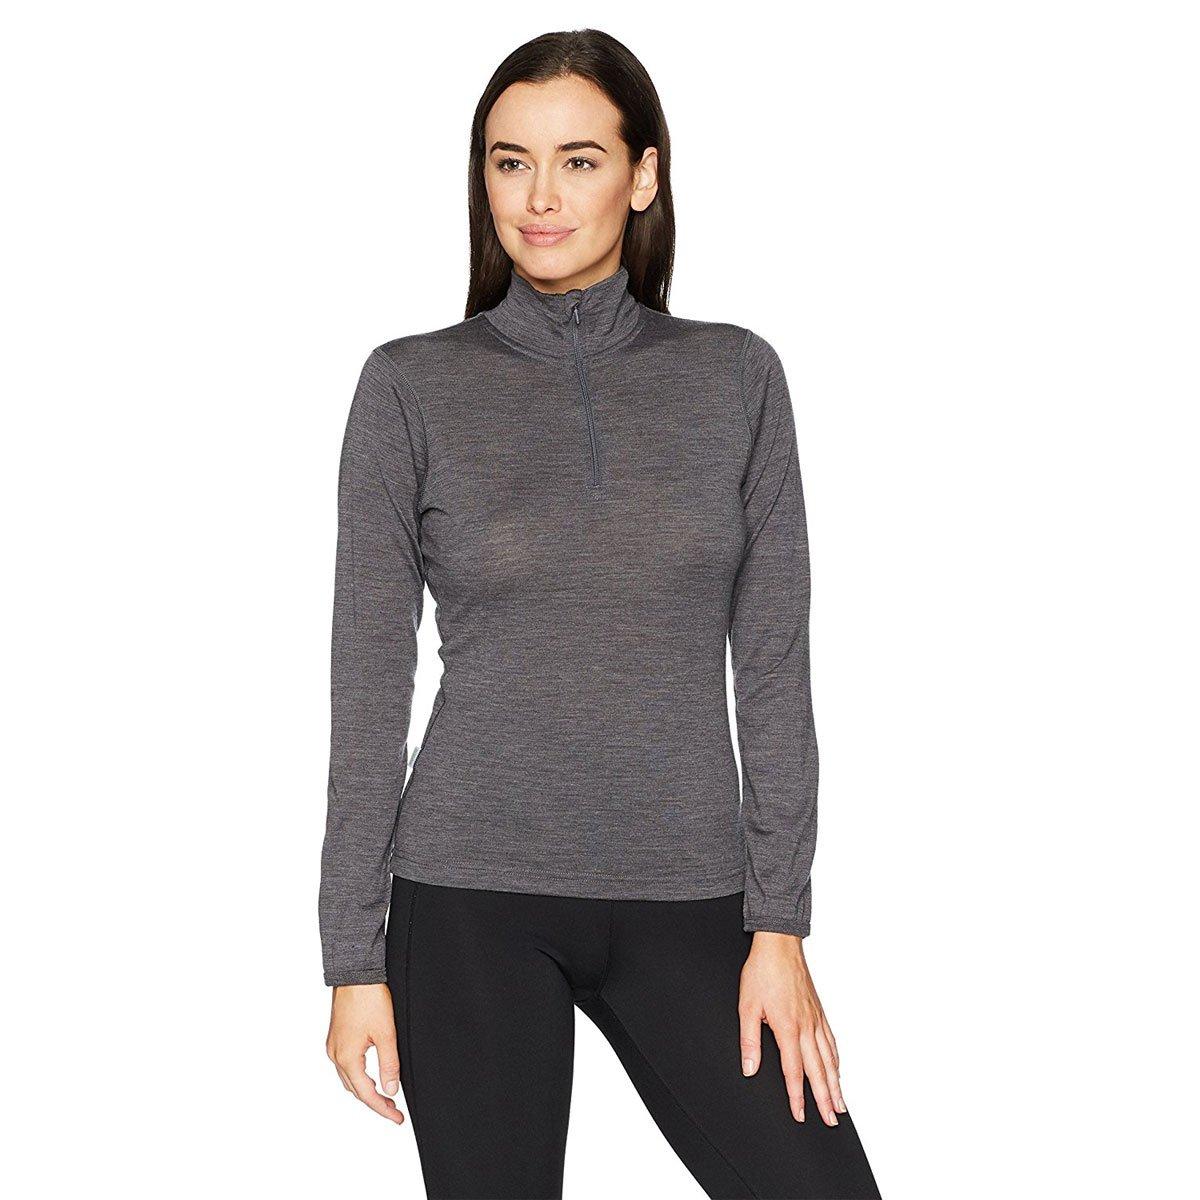 Minus33 Merino Wool Women's Liberty Lightweight 1/4 Zip, Charcoal, Medium